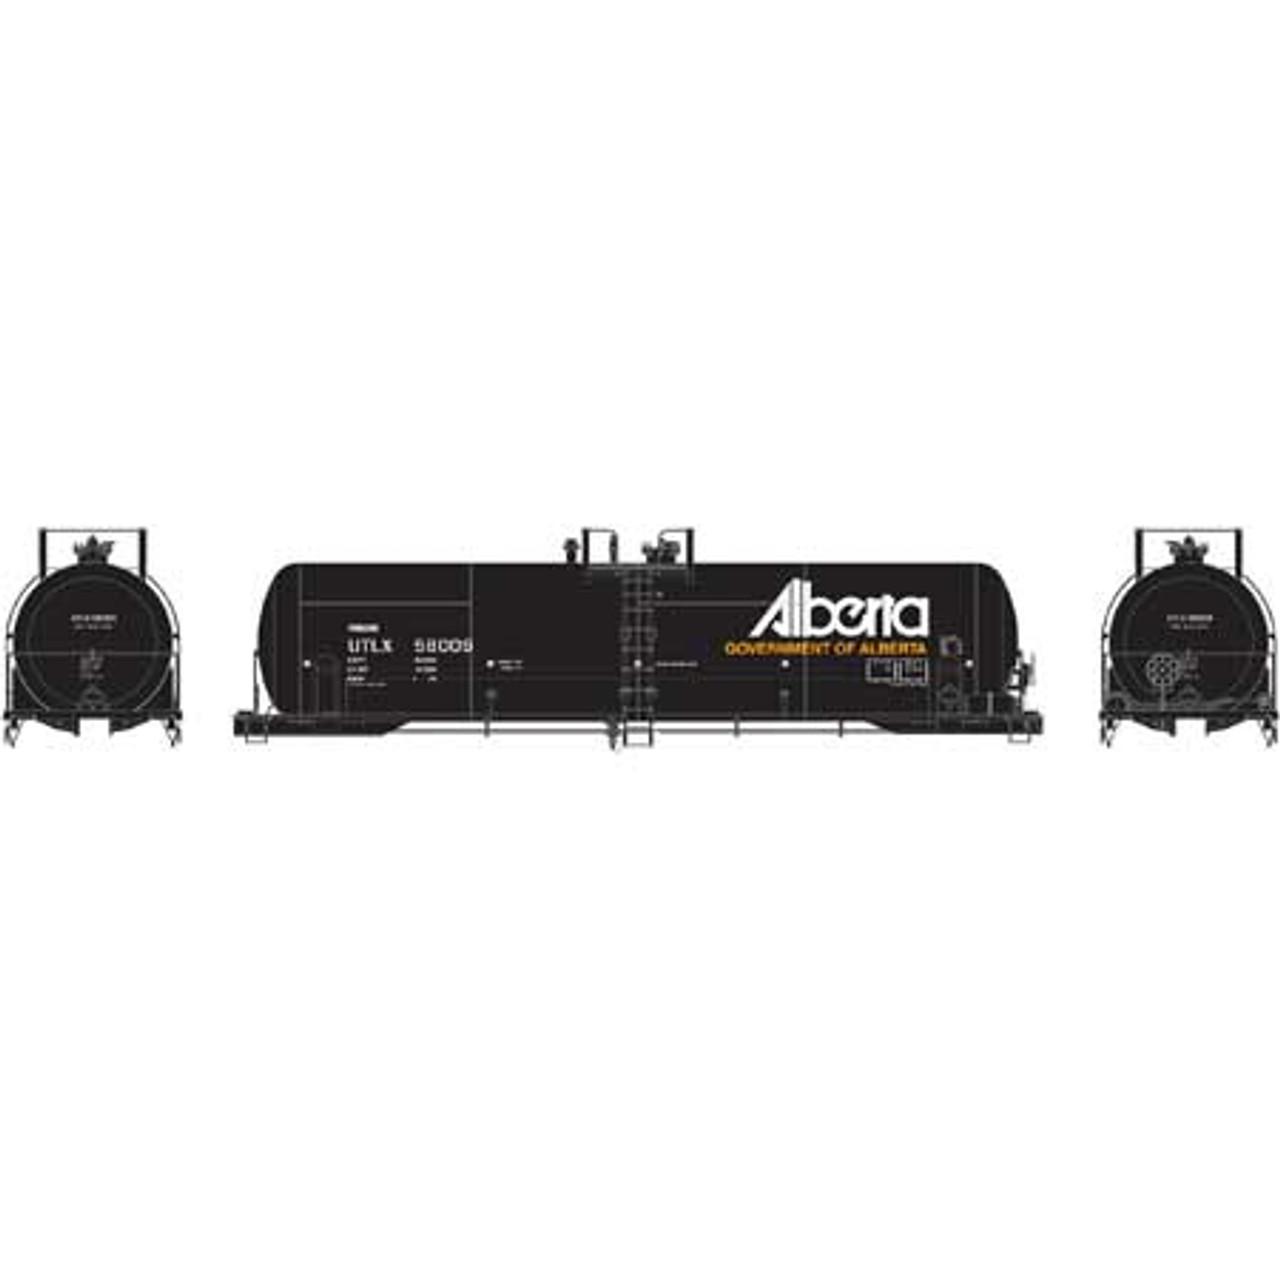 Athearn ATH15773 RTC 20K Tank Car ULTX - Alberta #58009  (Scale =HO) Part #ATH15773